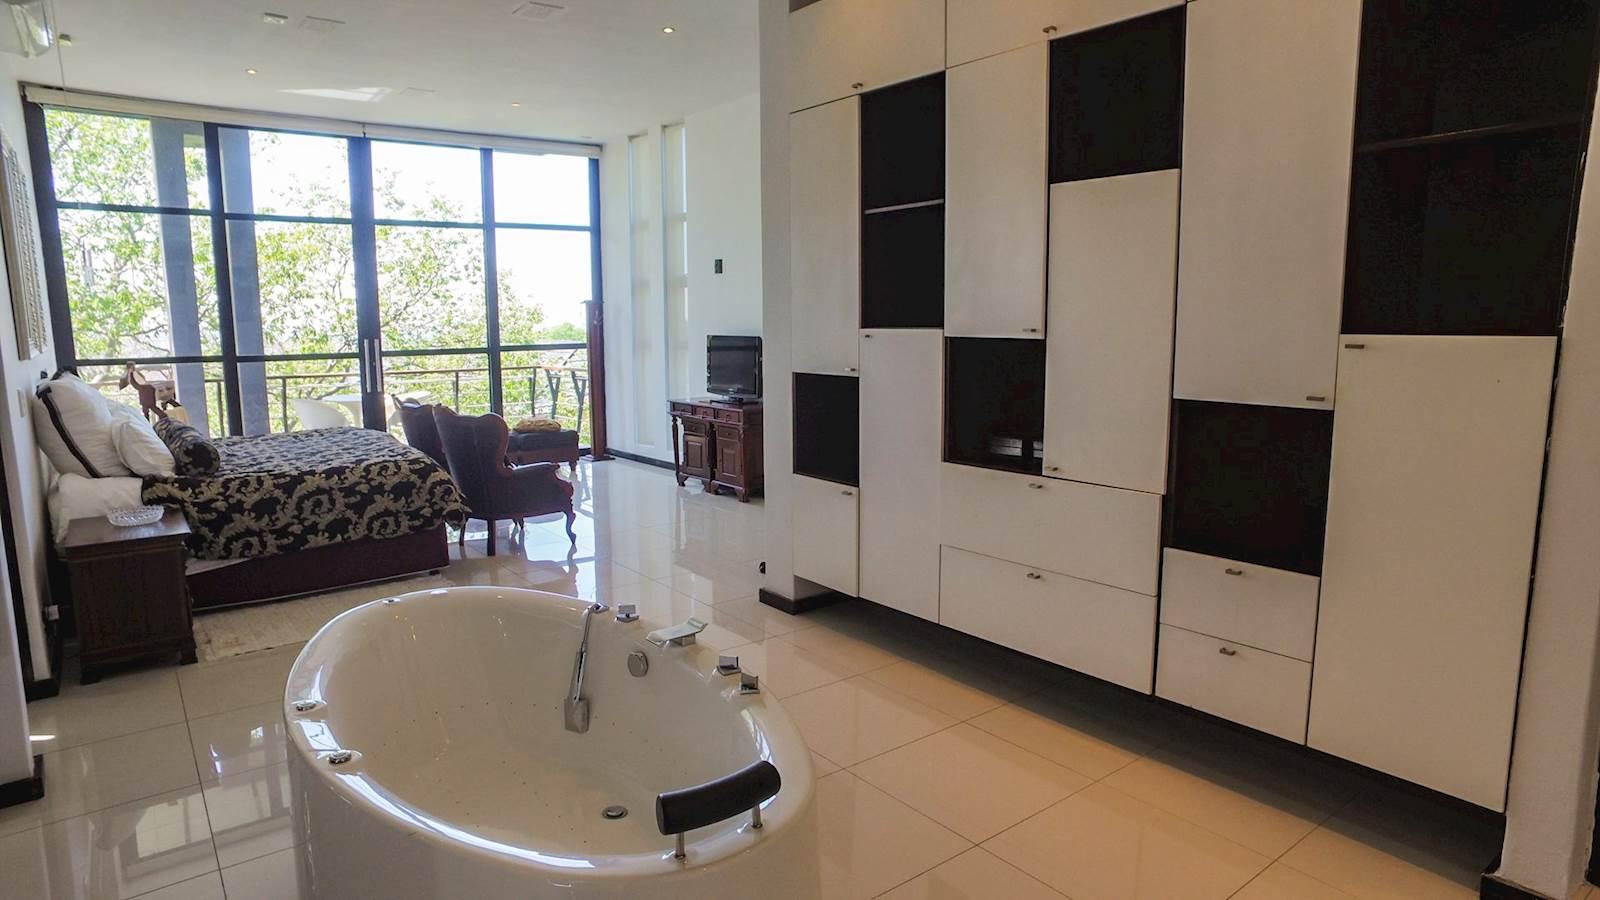 3 Bedroom House sold in Waterkloof Ridge ENT0010698 : photo#18